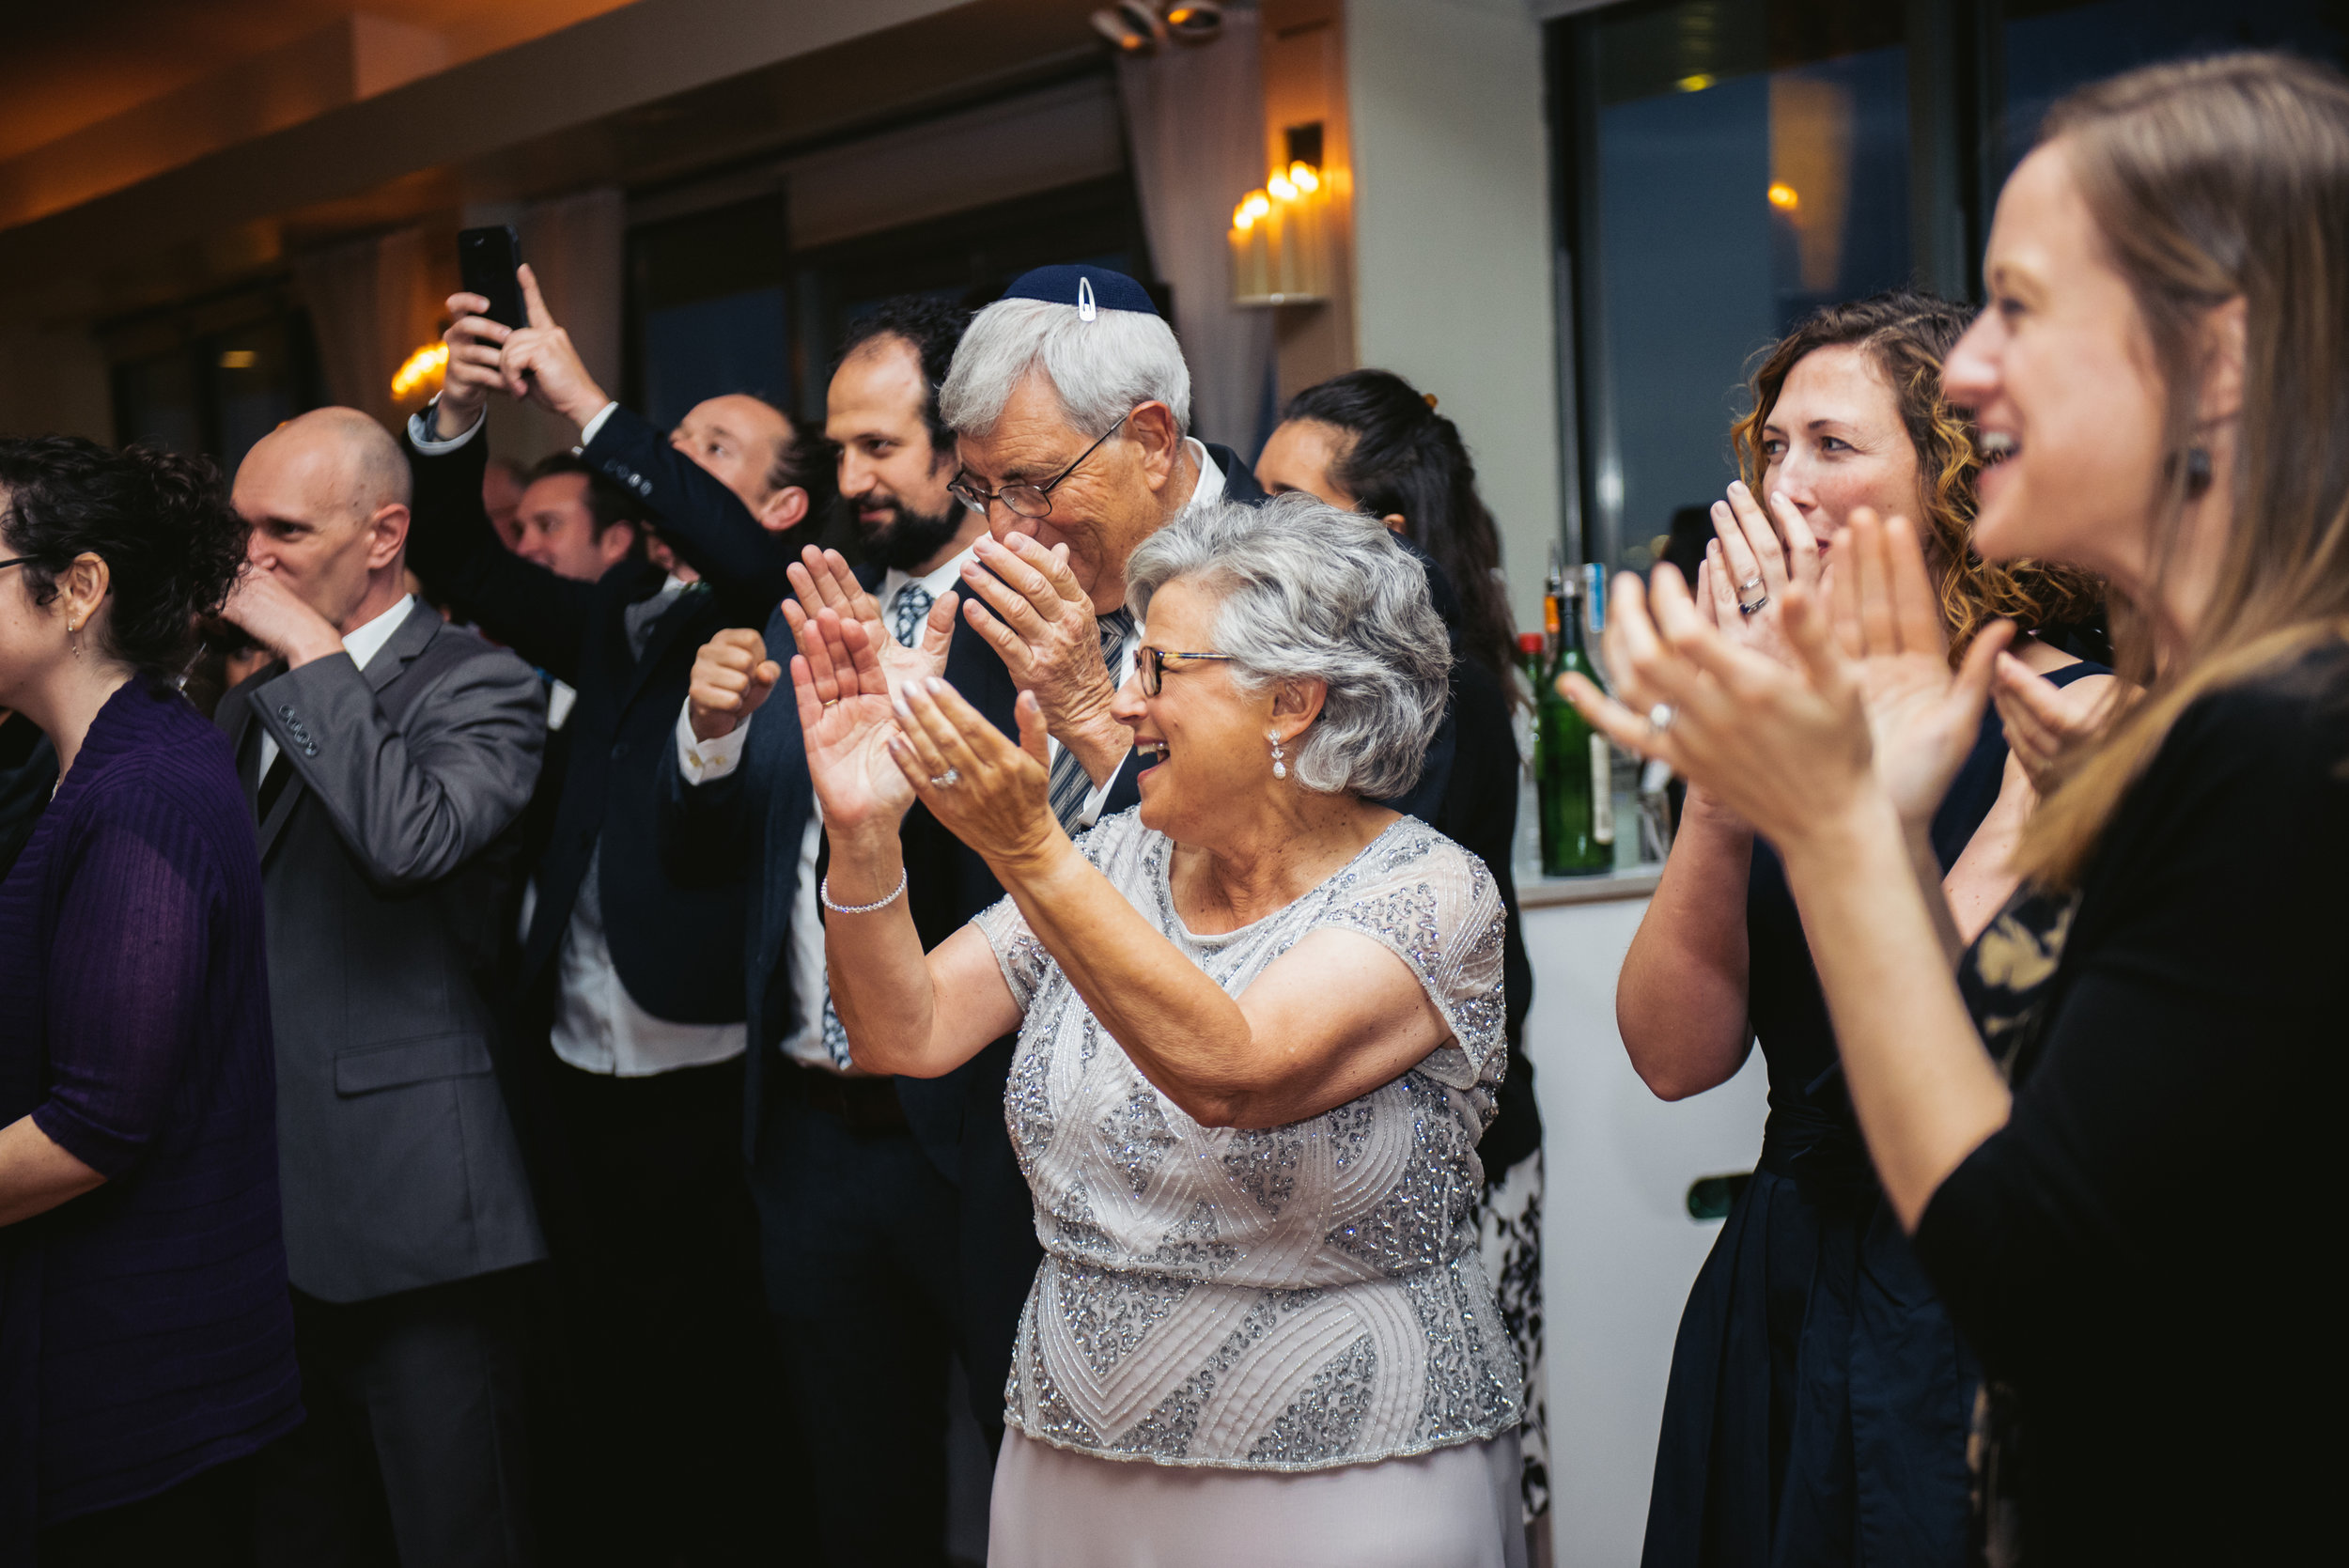 LIZA & JON - BATTERY PARK WEDDING - NYC INTIMATE WEDDING PHOTOGRAPHER - CHI-CHI AGBIM-669.jpg